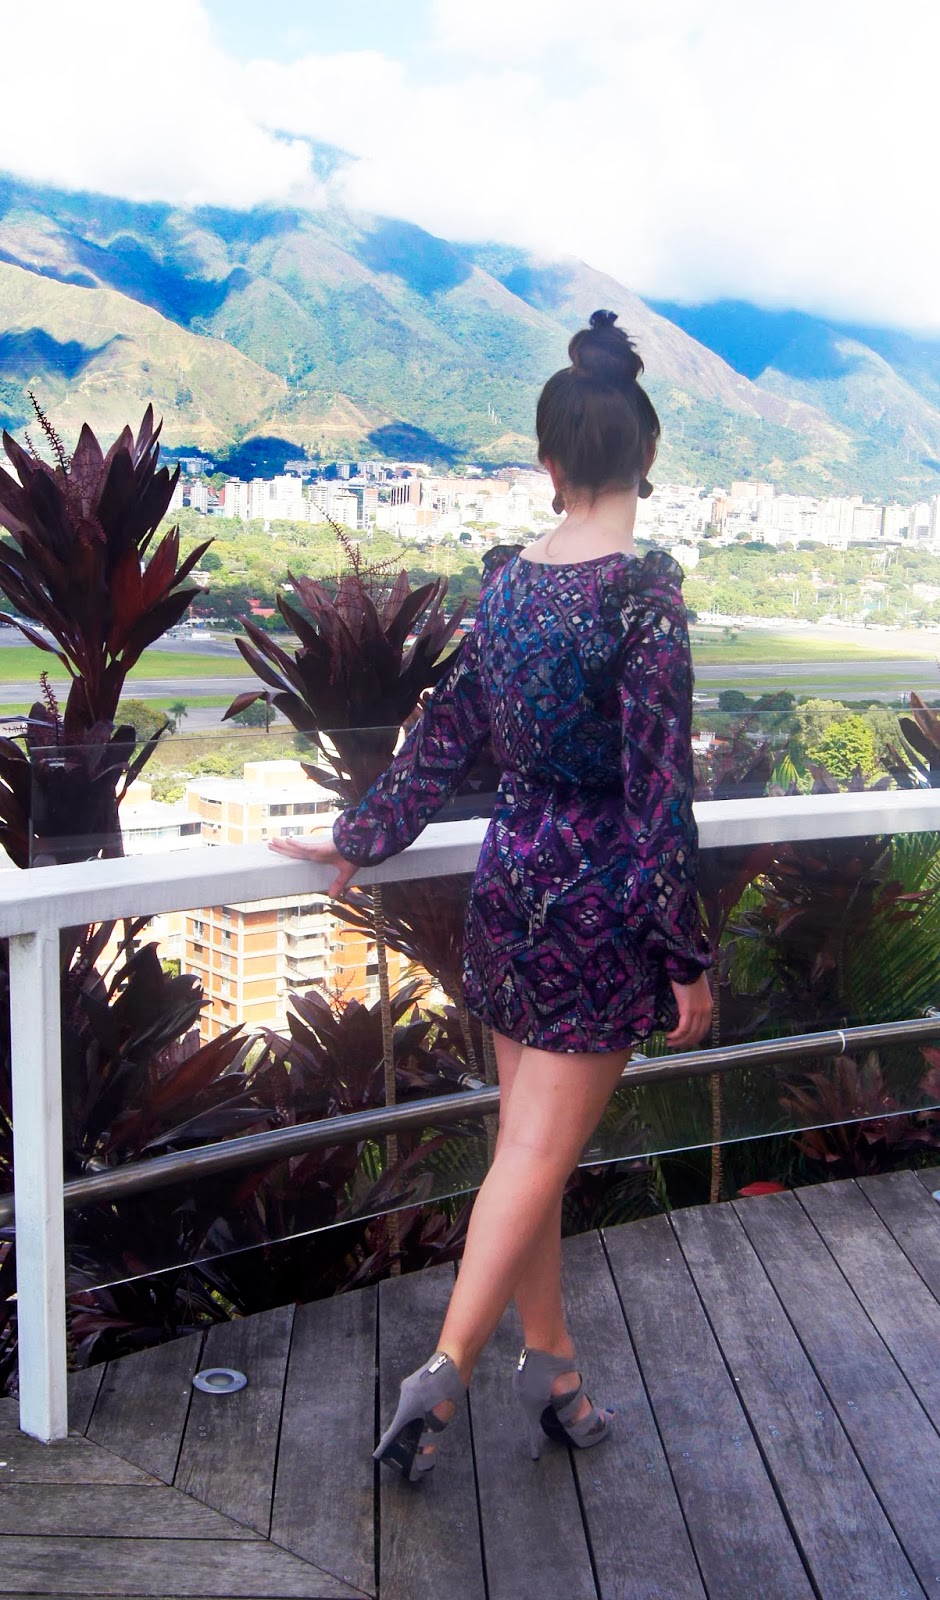 hey vicky hey, victoria suarez, valentine's day, san valentin, columpio ropa, blogger, fashion